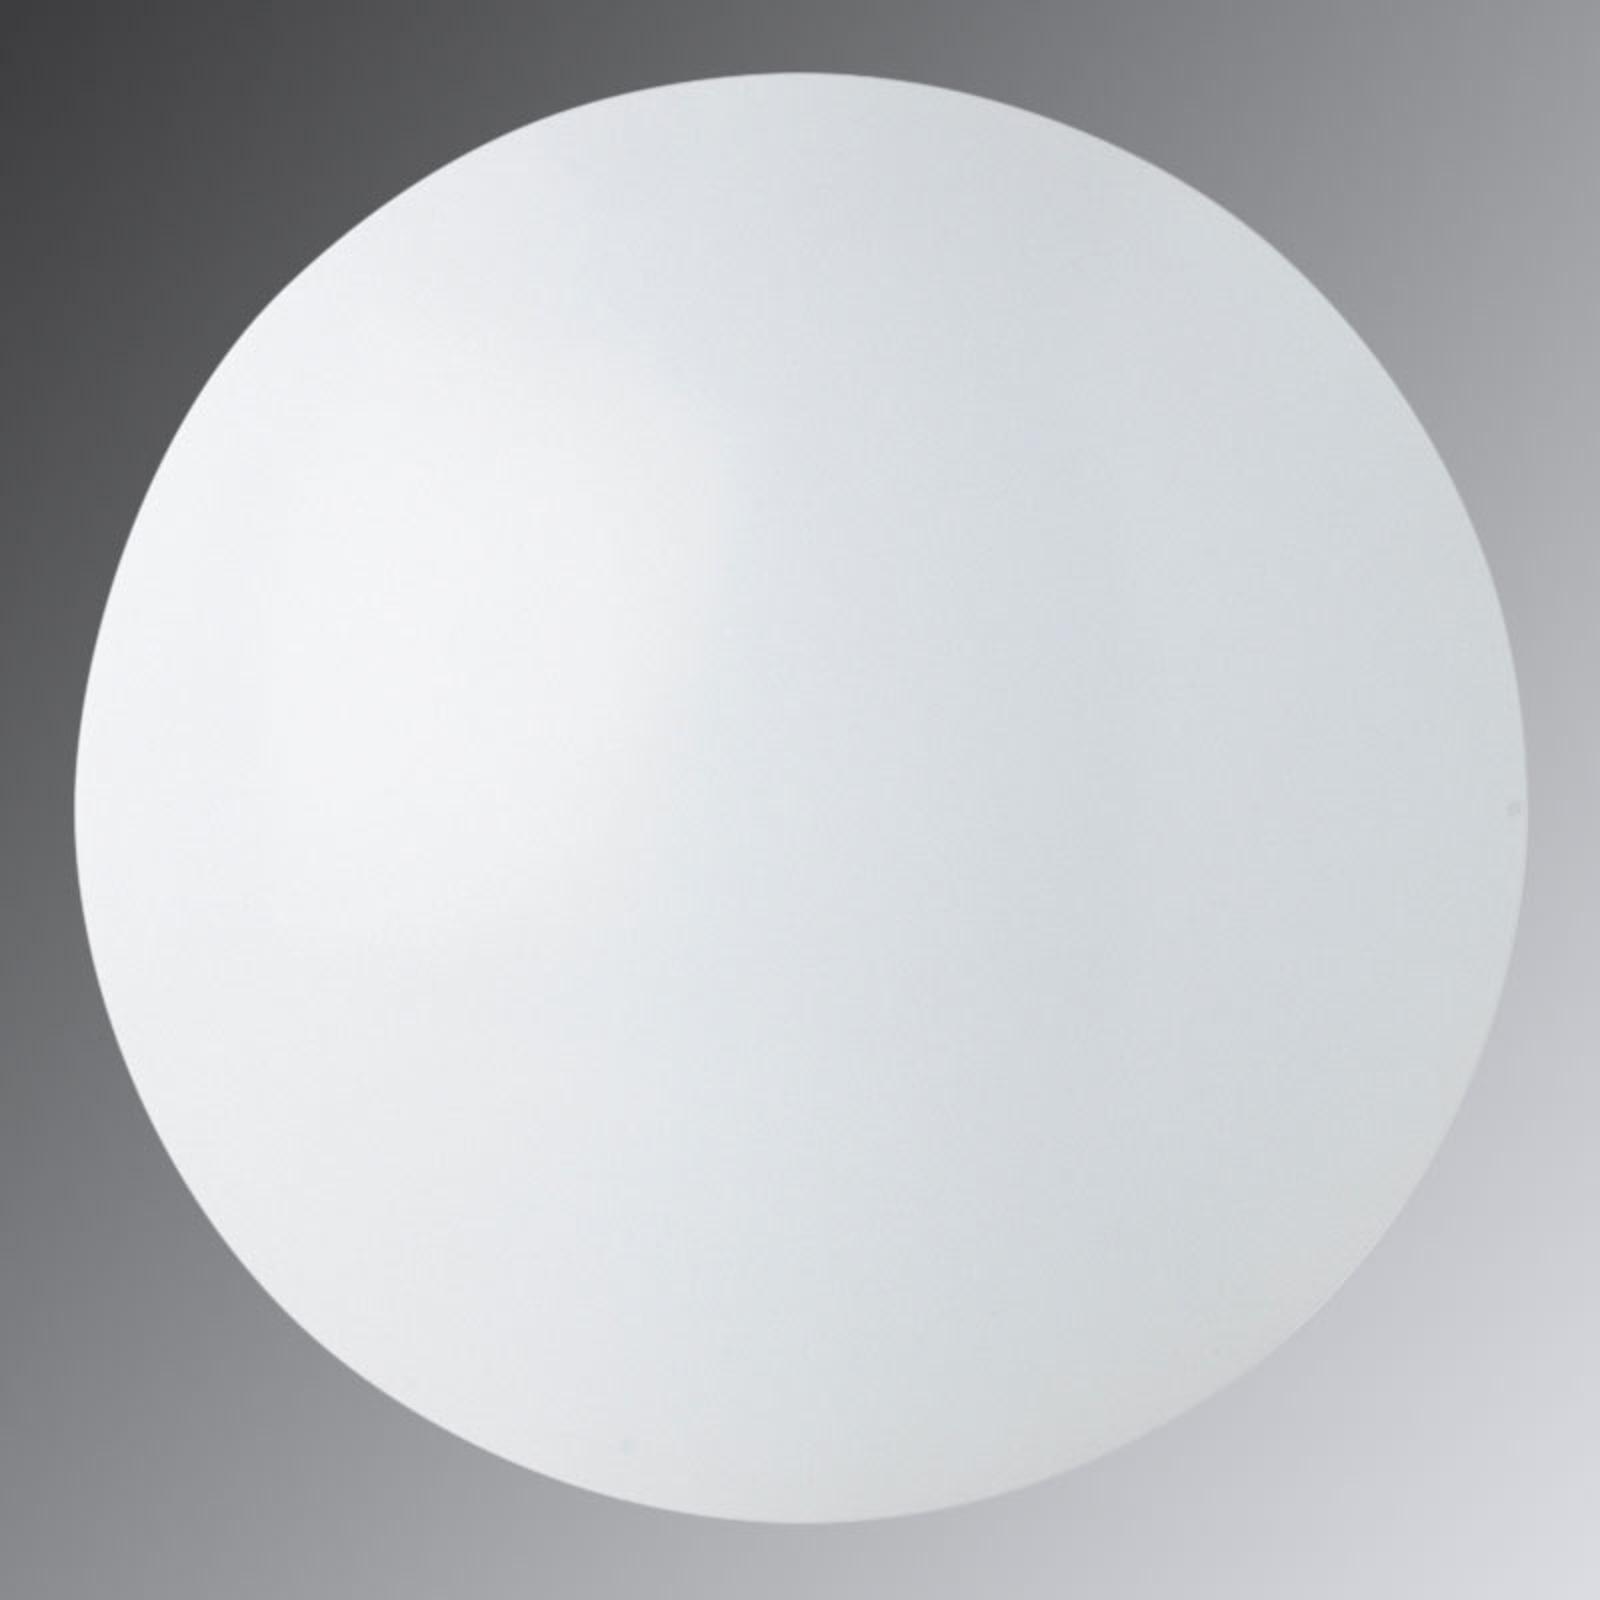 Schakelbare LED plafondlamp Renzo, 22 W, 3.000 K